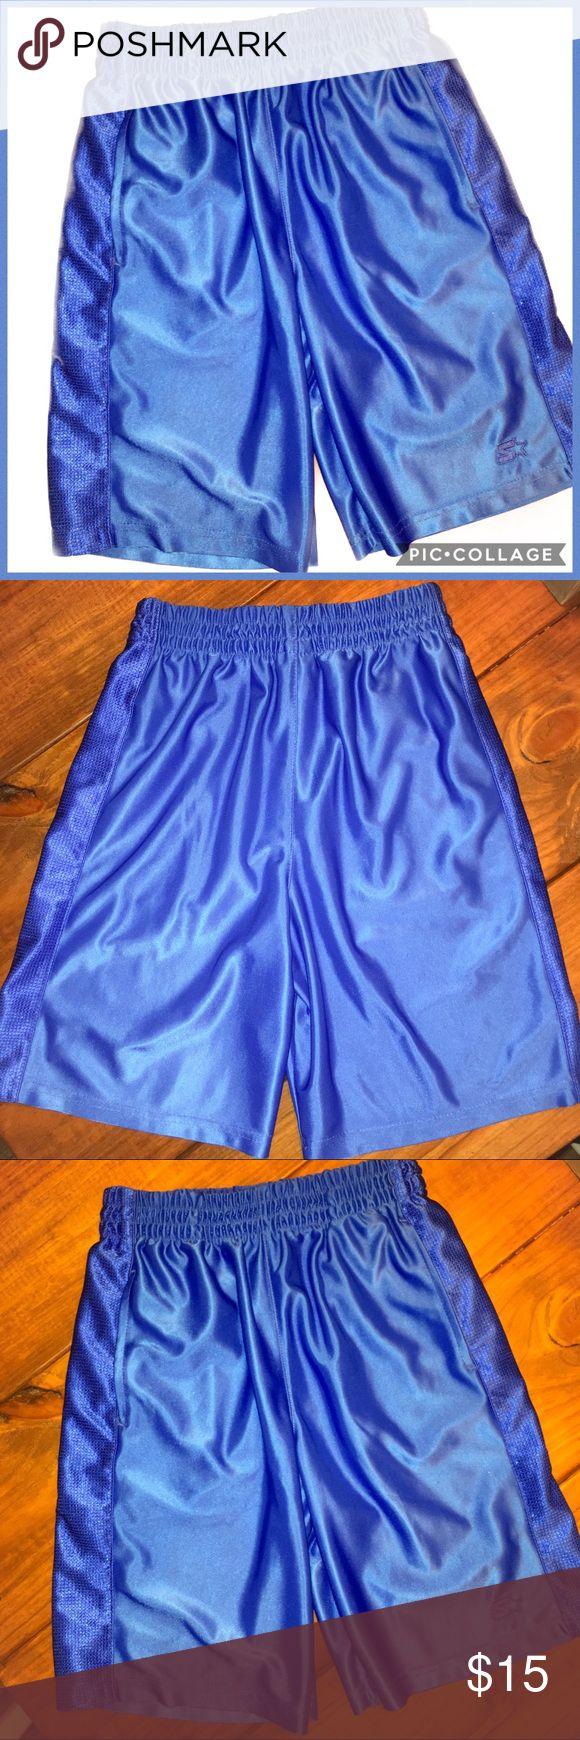 Boy's Royal Blue Athletic Shorts Size L 10/12 Boy's Royal Blue Athletic Shorts - Size L 10/12 - *Excellent Condition* Bottoms Shorts